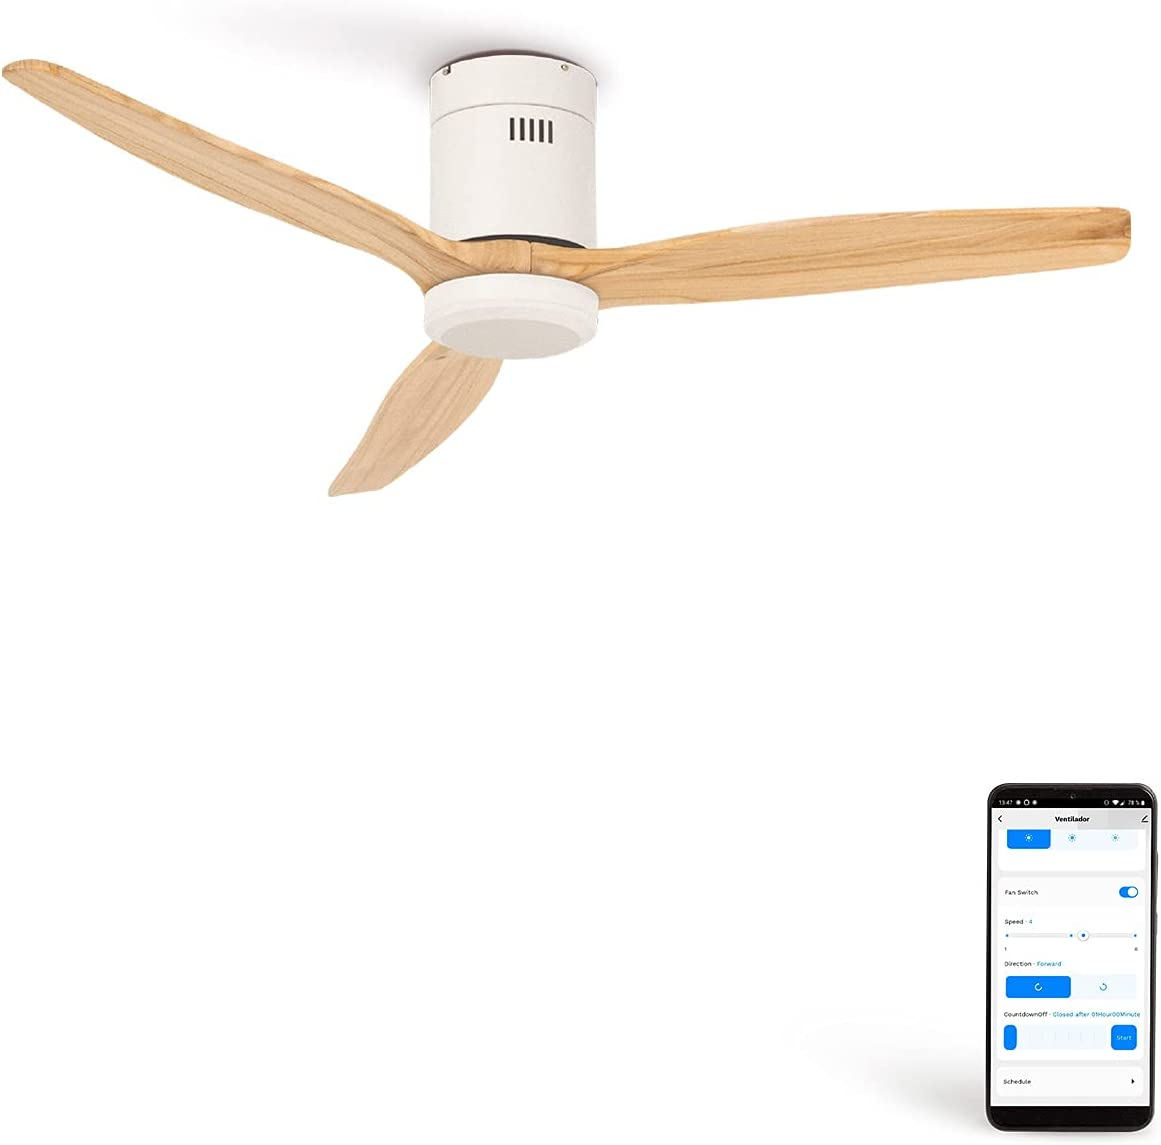 CREATE IKOHS WINDCALM DC STYLANCE - Ventilador de Techo Wifi, con Mando a Distancia, 3 Aspas, Potencia de 40W, Ultrasilencioso, 132 cm de Diametro, 6 Velocidades (Blanco y madera natural)